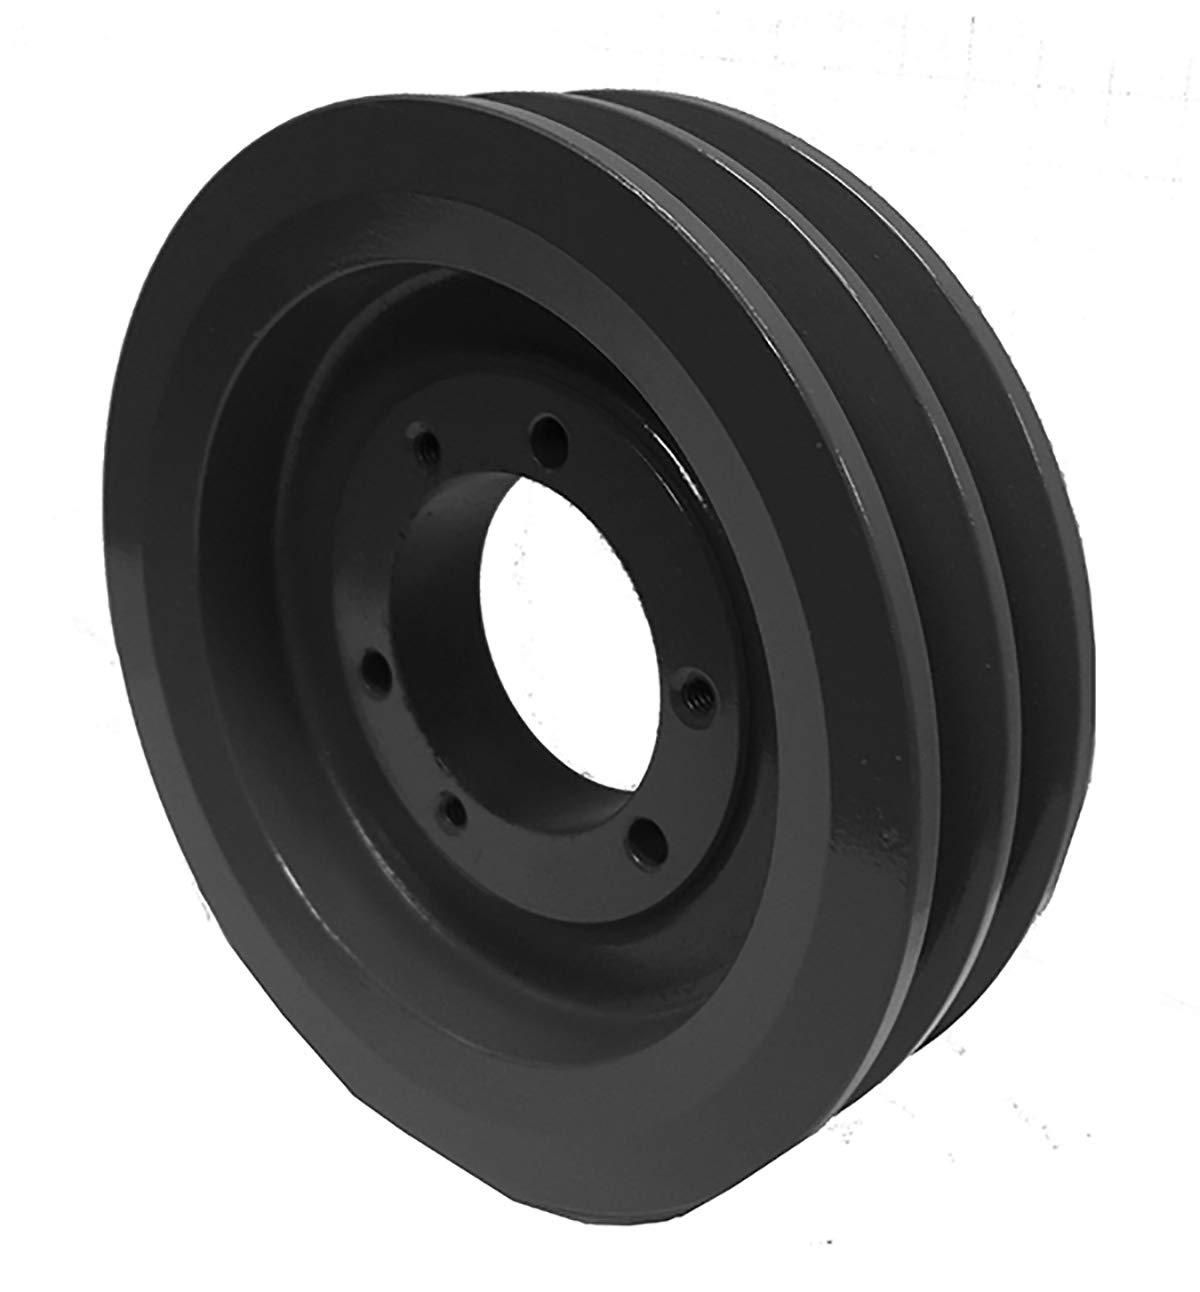 Powerhouse HTD 2B46SDS V-Belt Pulley - Cast Iron